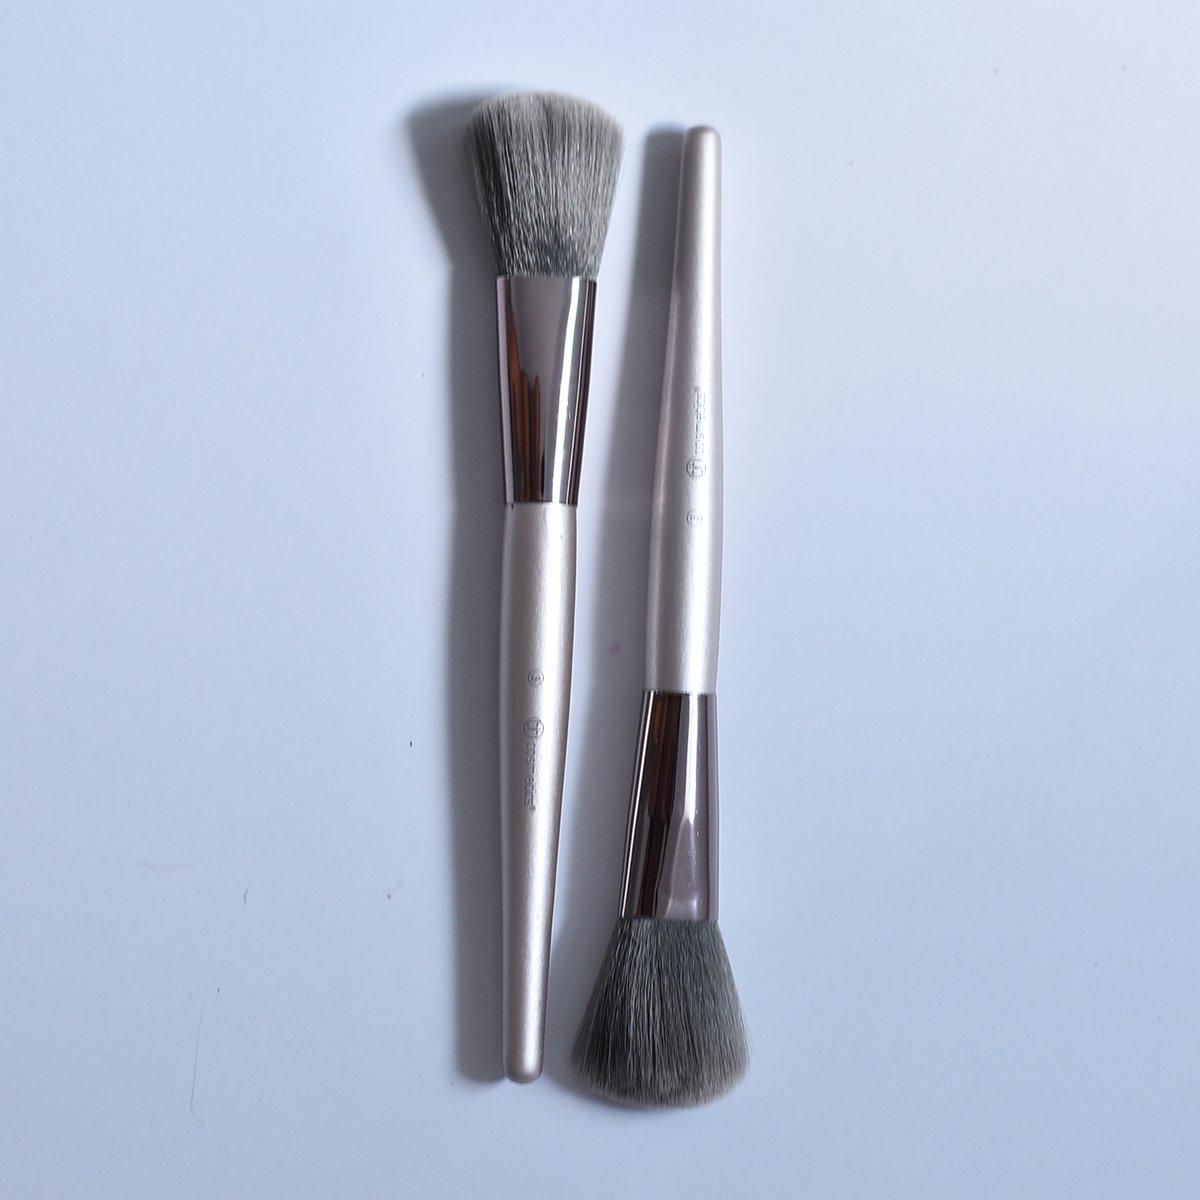 Cọ Má Hồng - Highlight Bh Cosmetics Lavish Số 3